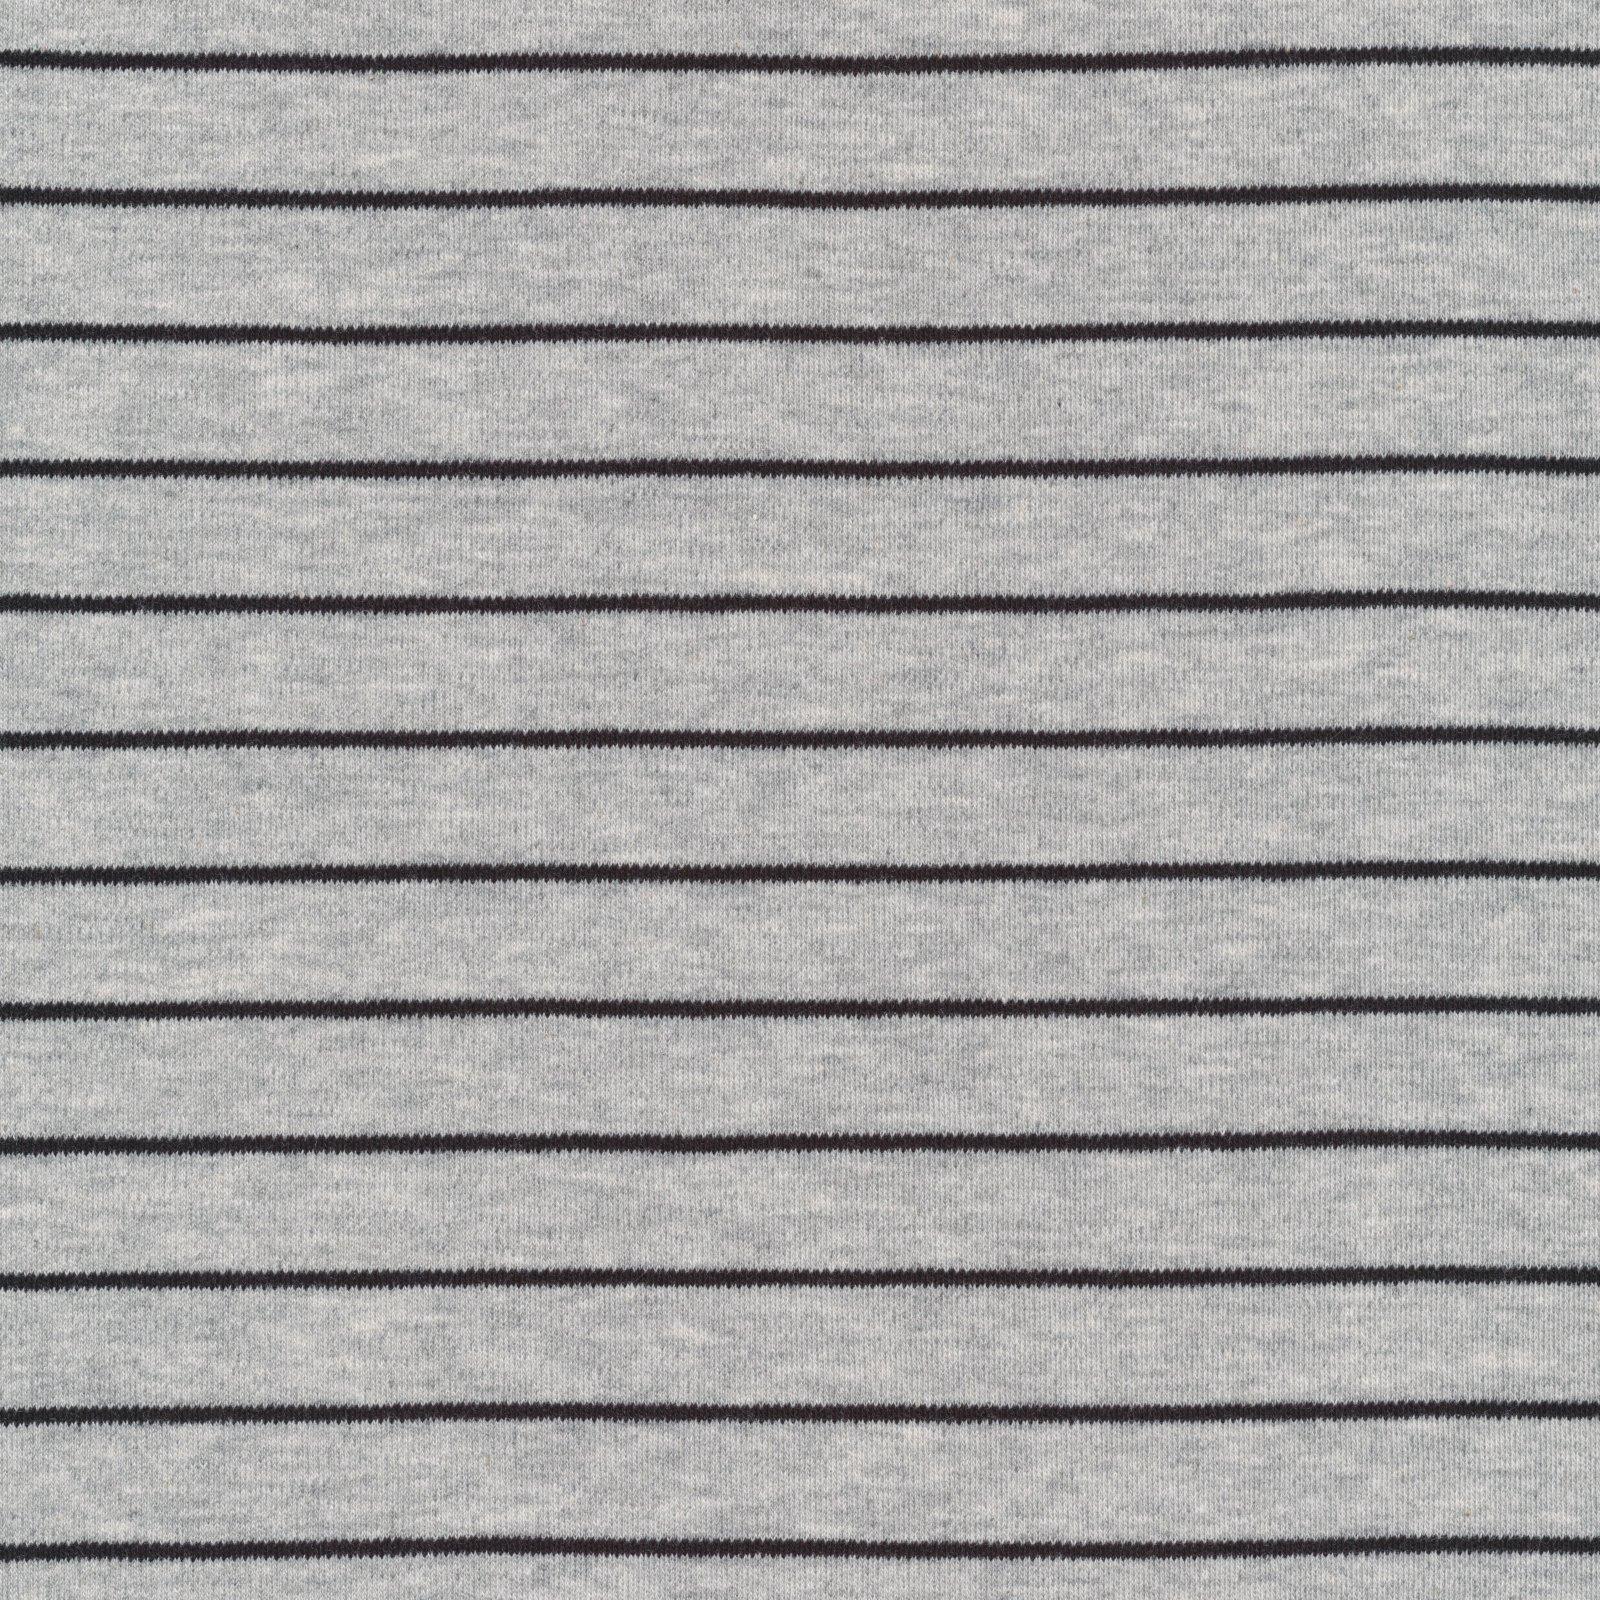 Cloud 9 - Organic Cotton Knit - Stripes - Heather Gray